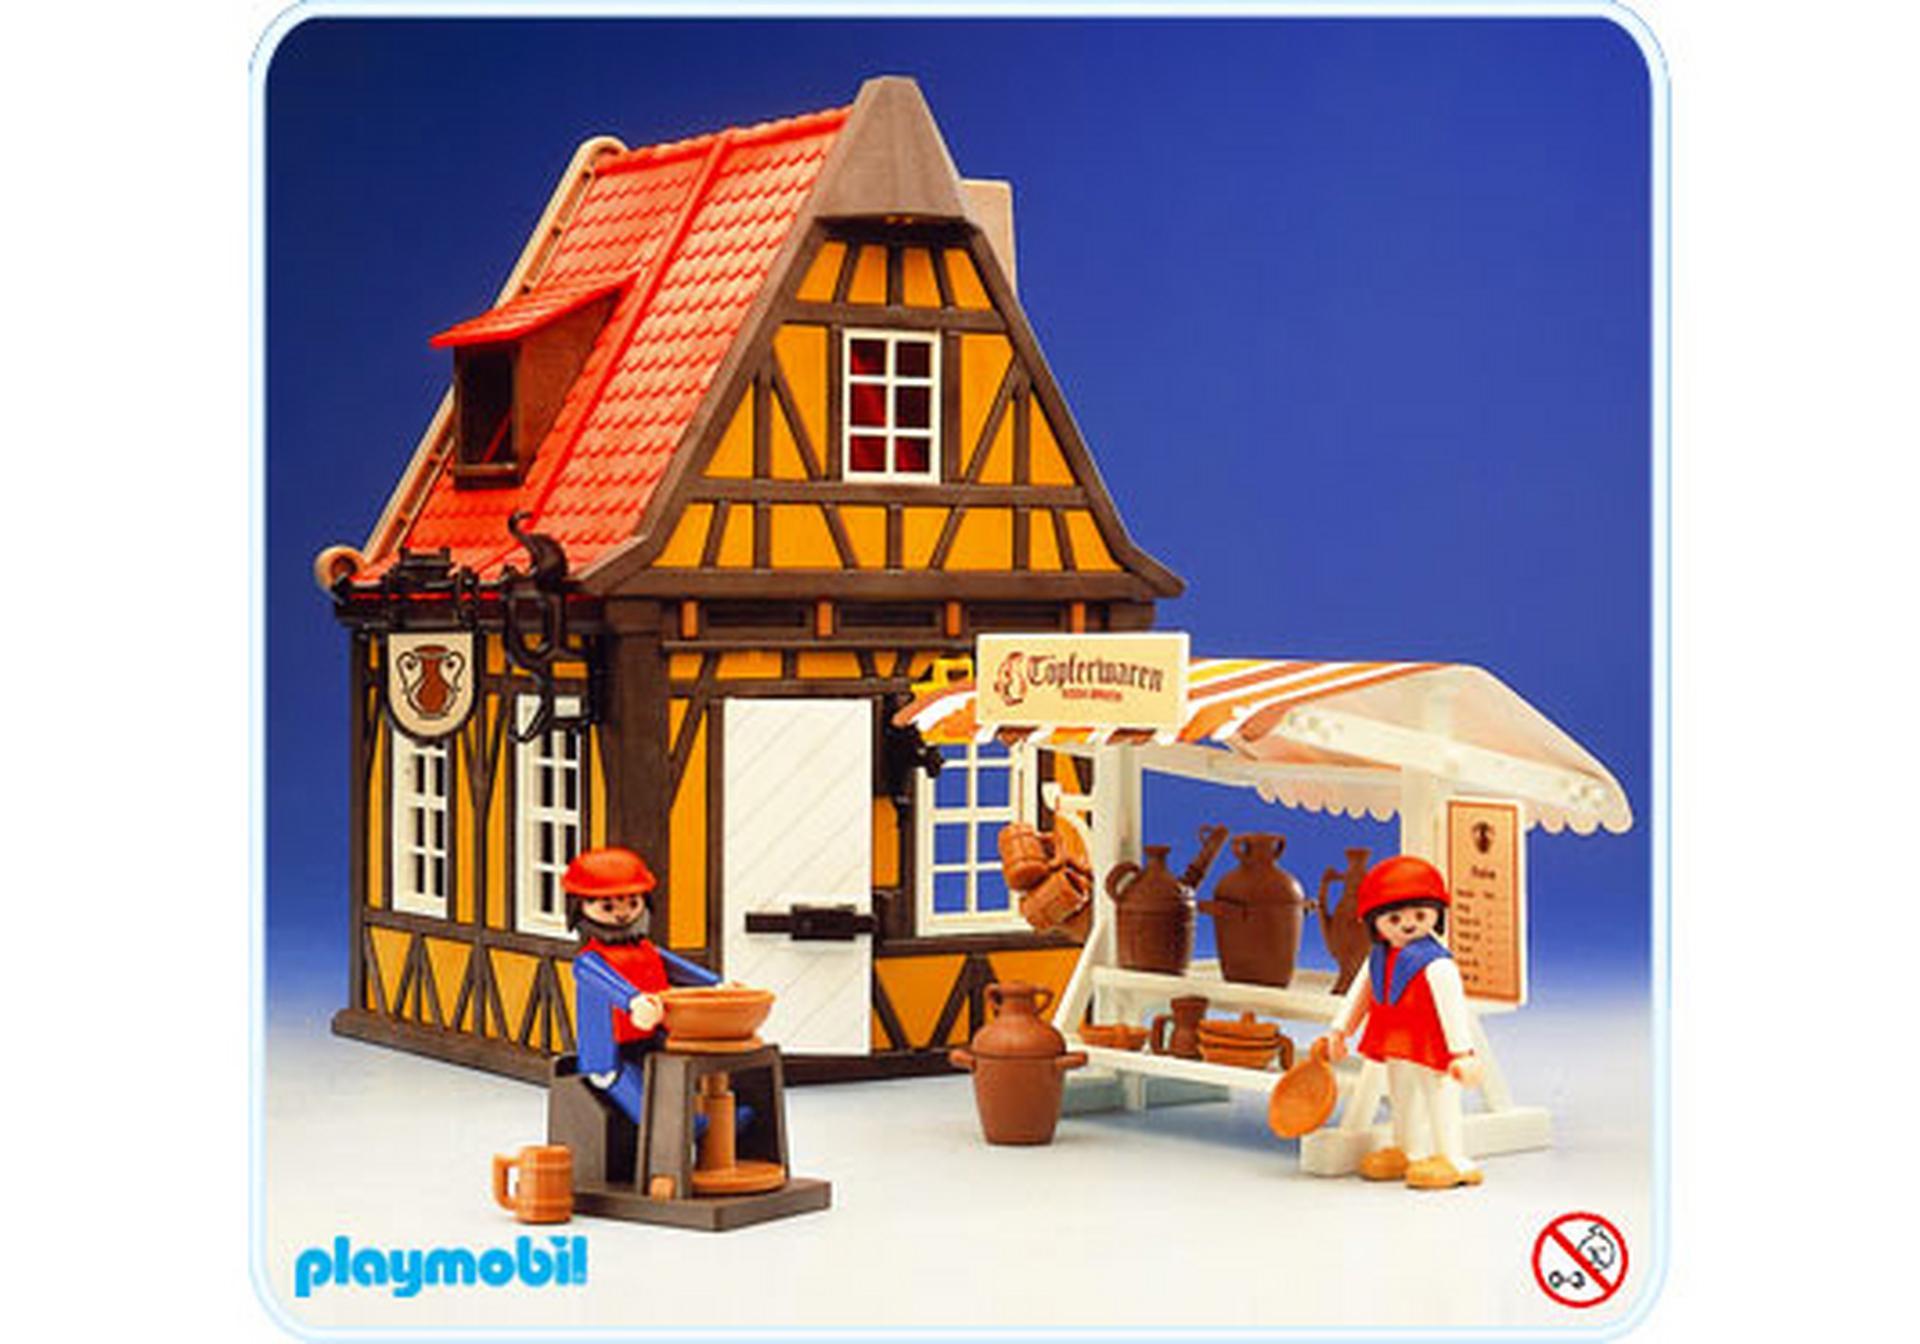 t pferei 3455 a playmobil deutschland. Black Bedroom Furniture Sets. Home Design Ideas